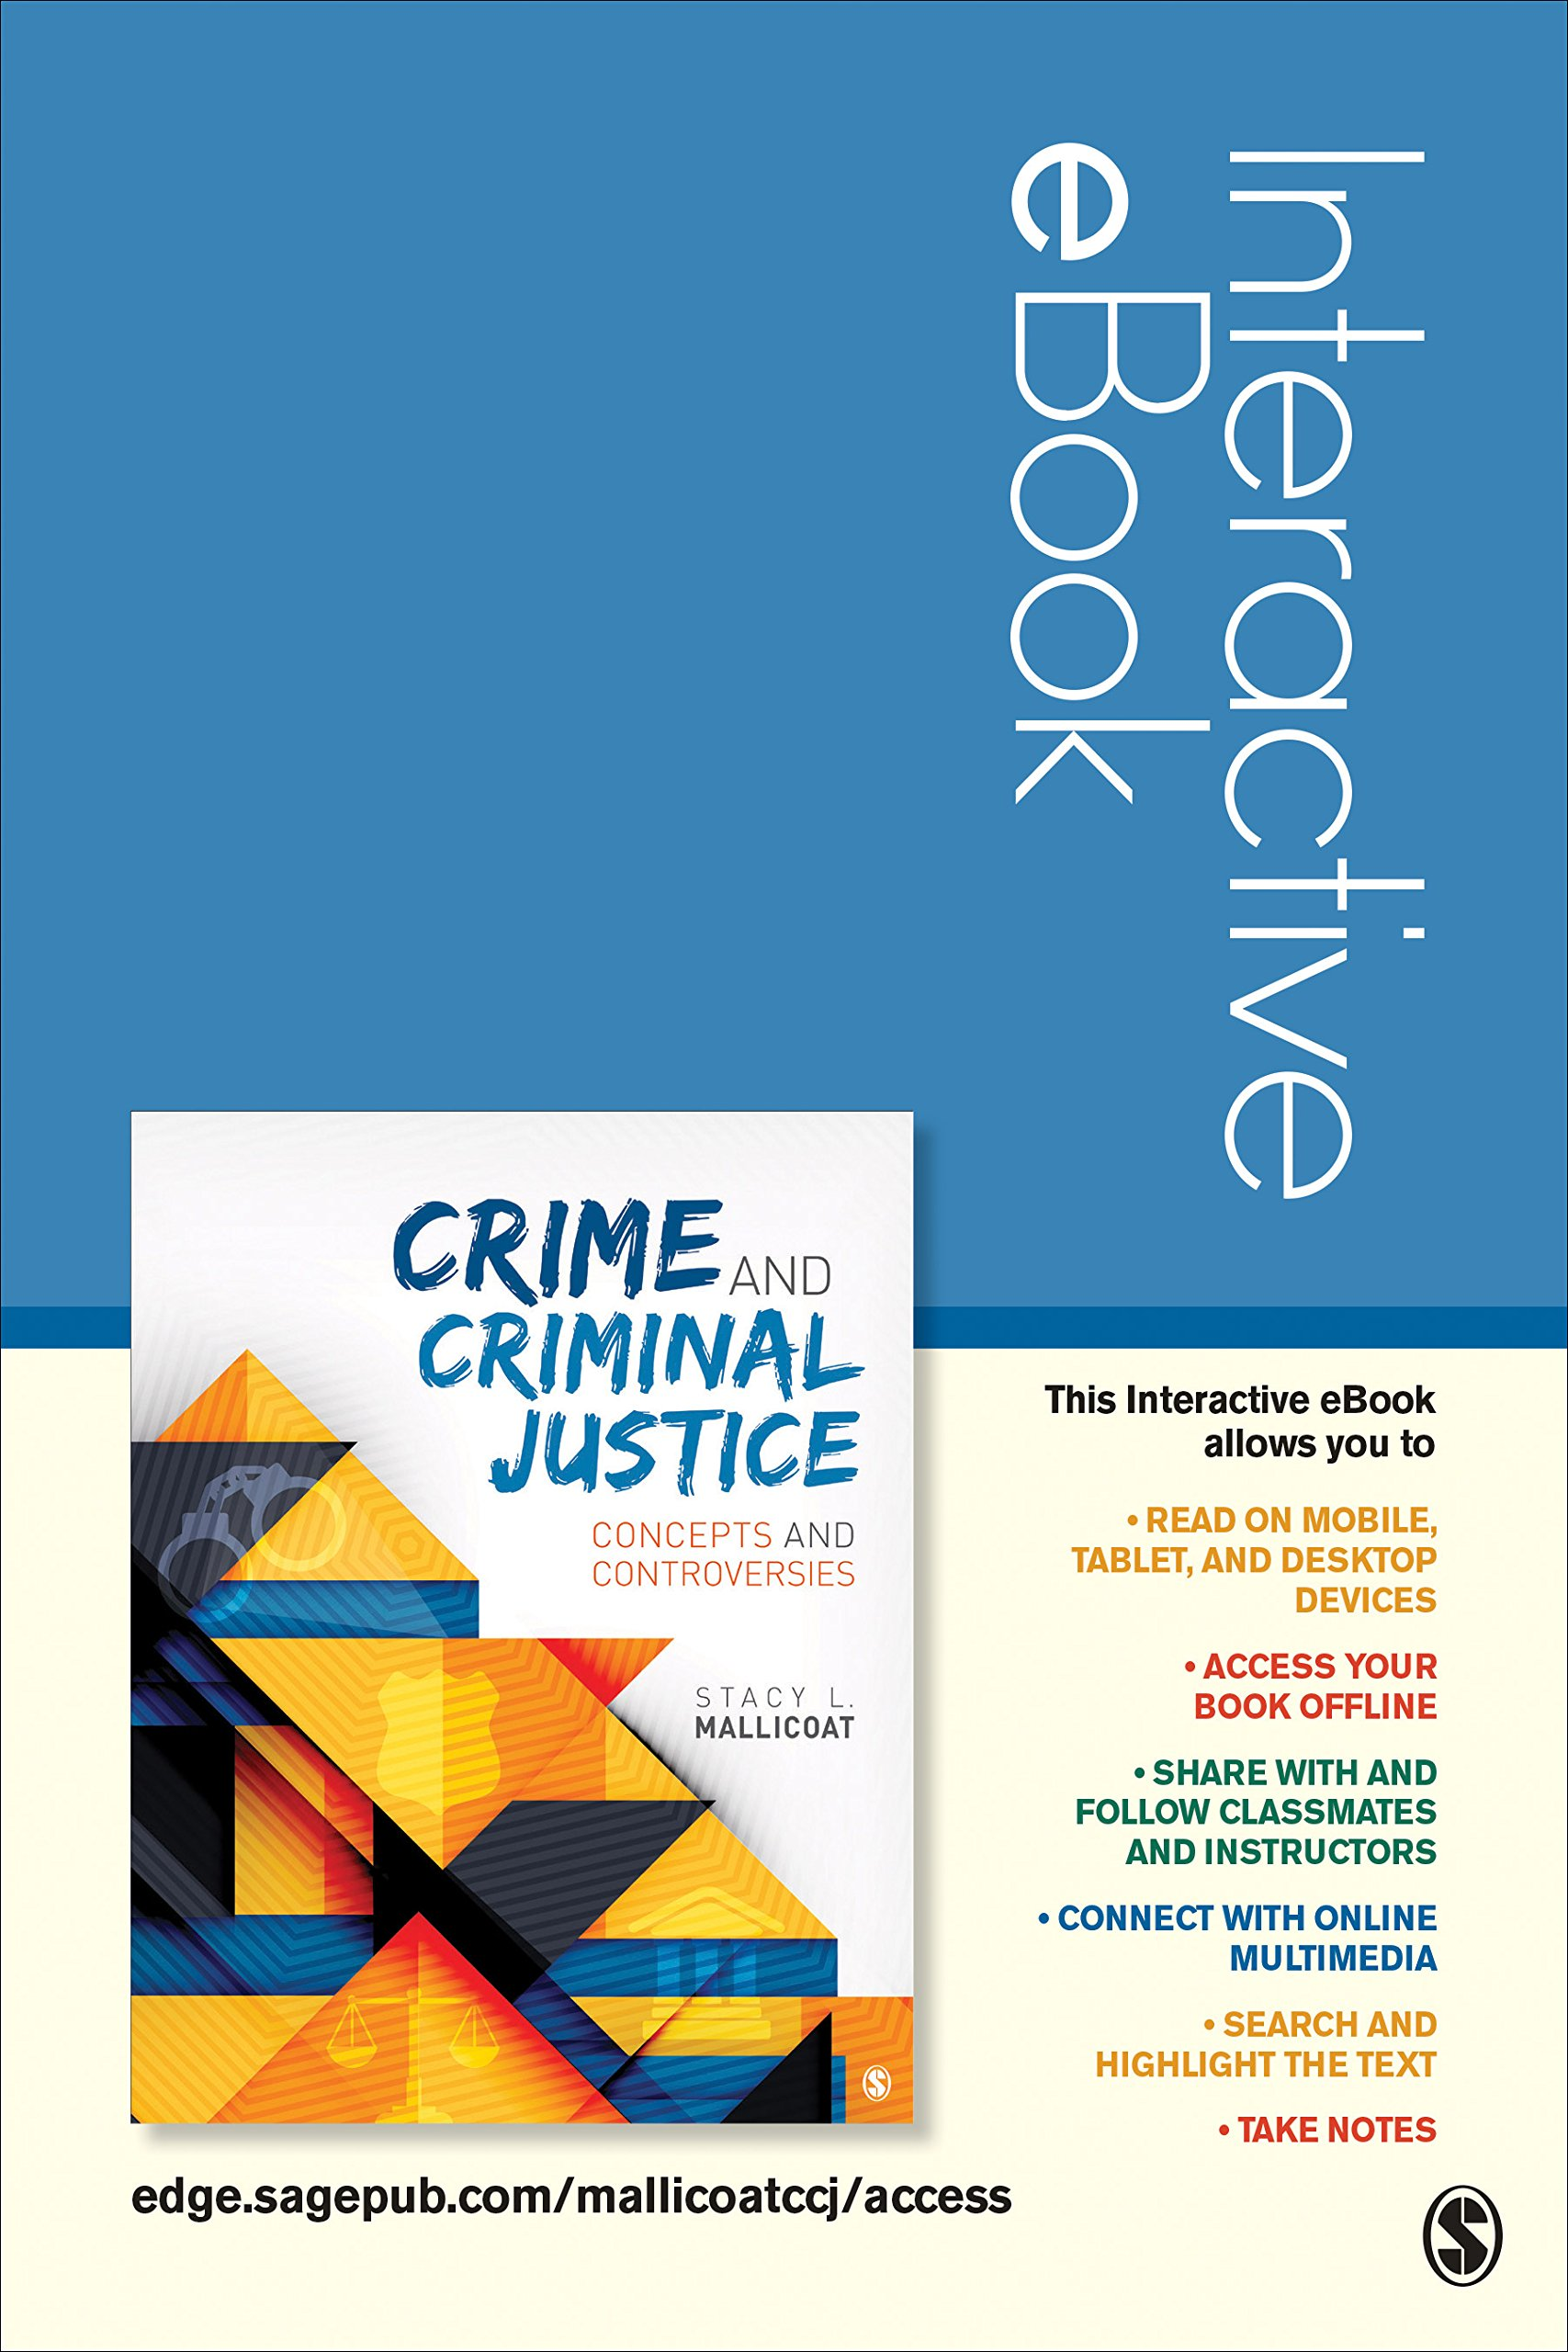 CRIME CRIMINAL JUSTICE INTER Amazones Stacy L Mallicoat Libros En Idiomas Extranjeros